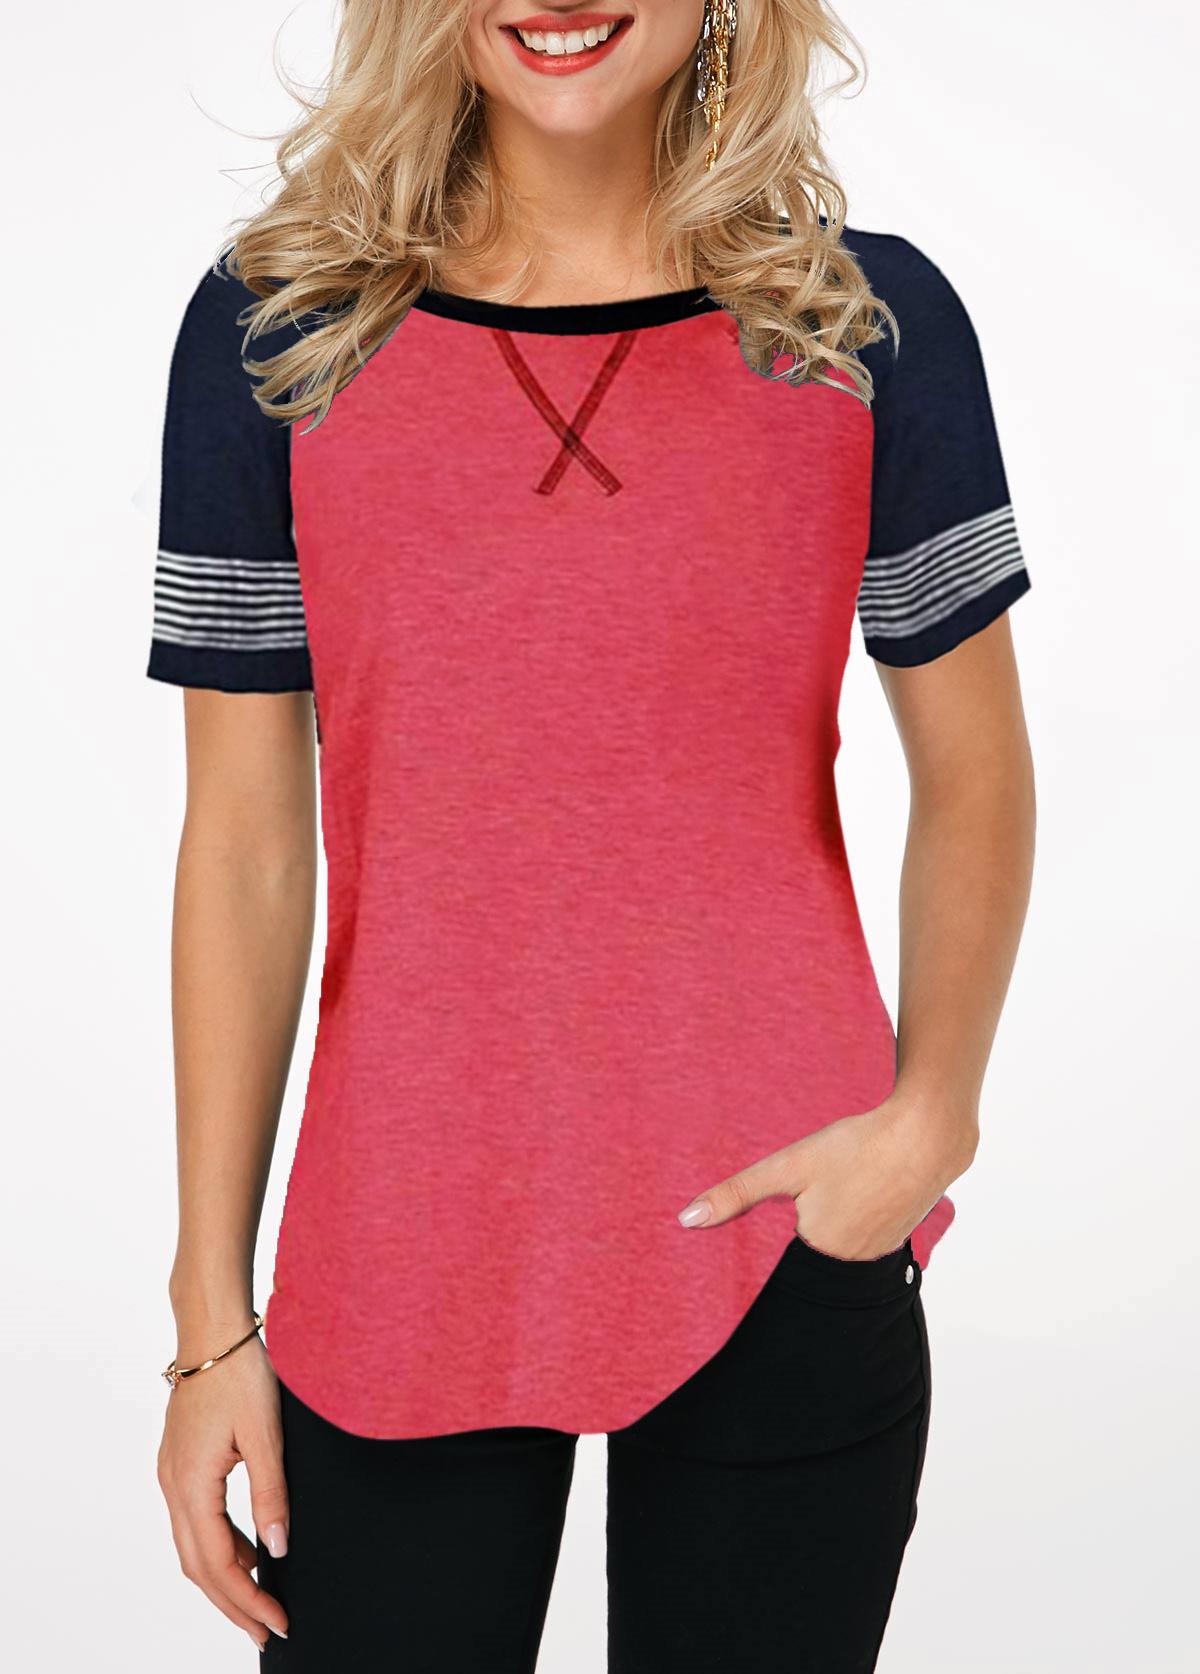 Contrast Round Neck Short Sleeve T Shirt